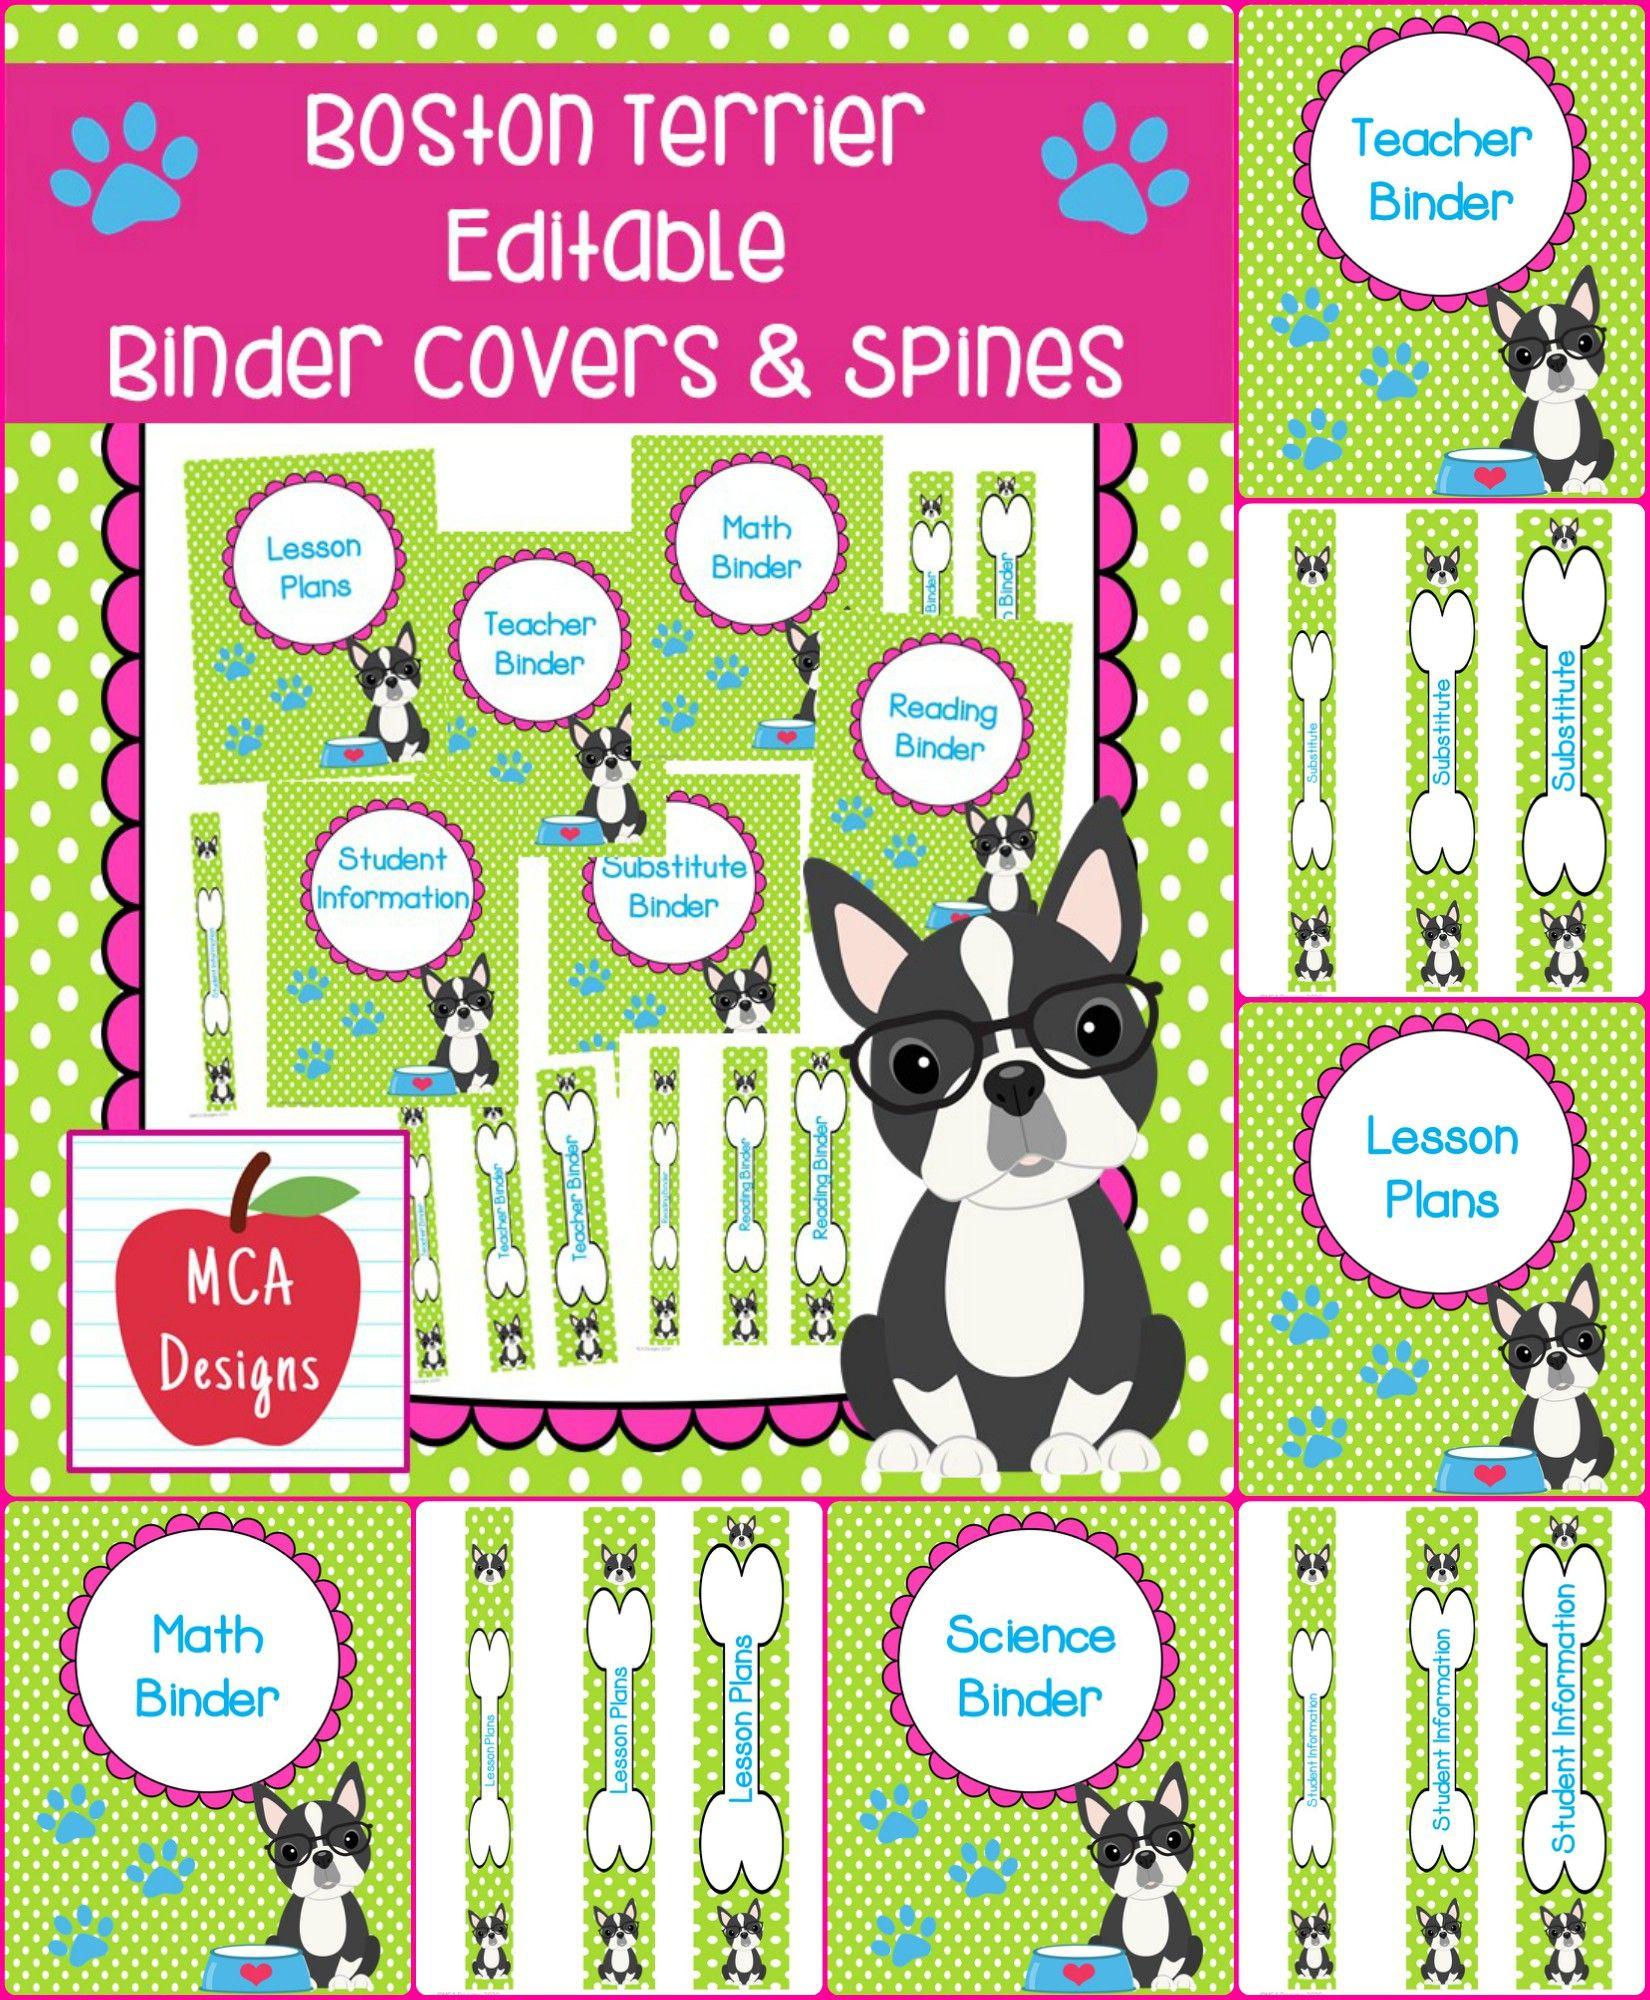 Boston Terrier - Editable Binder Covers & Spines